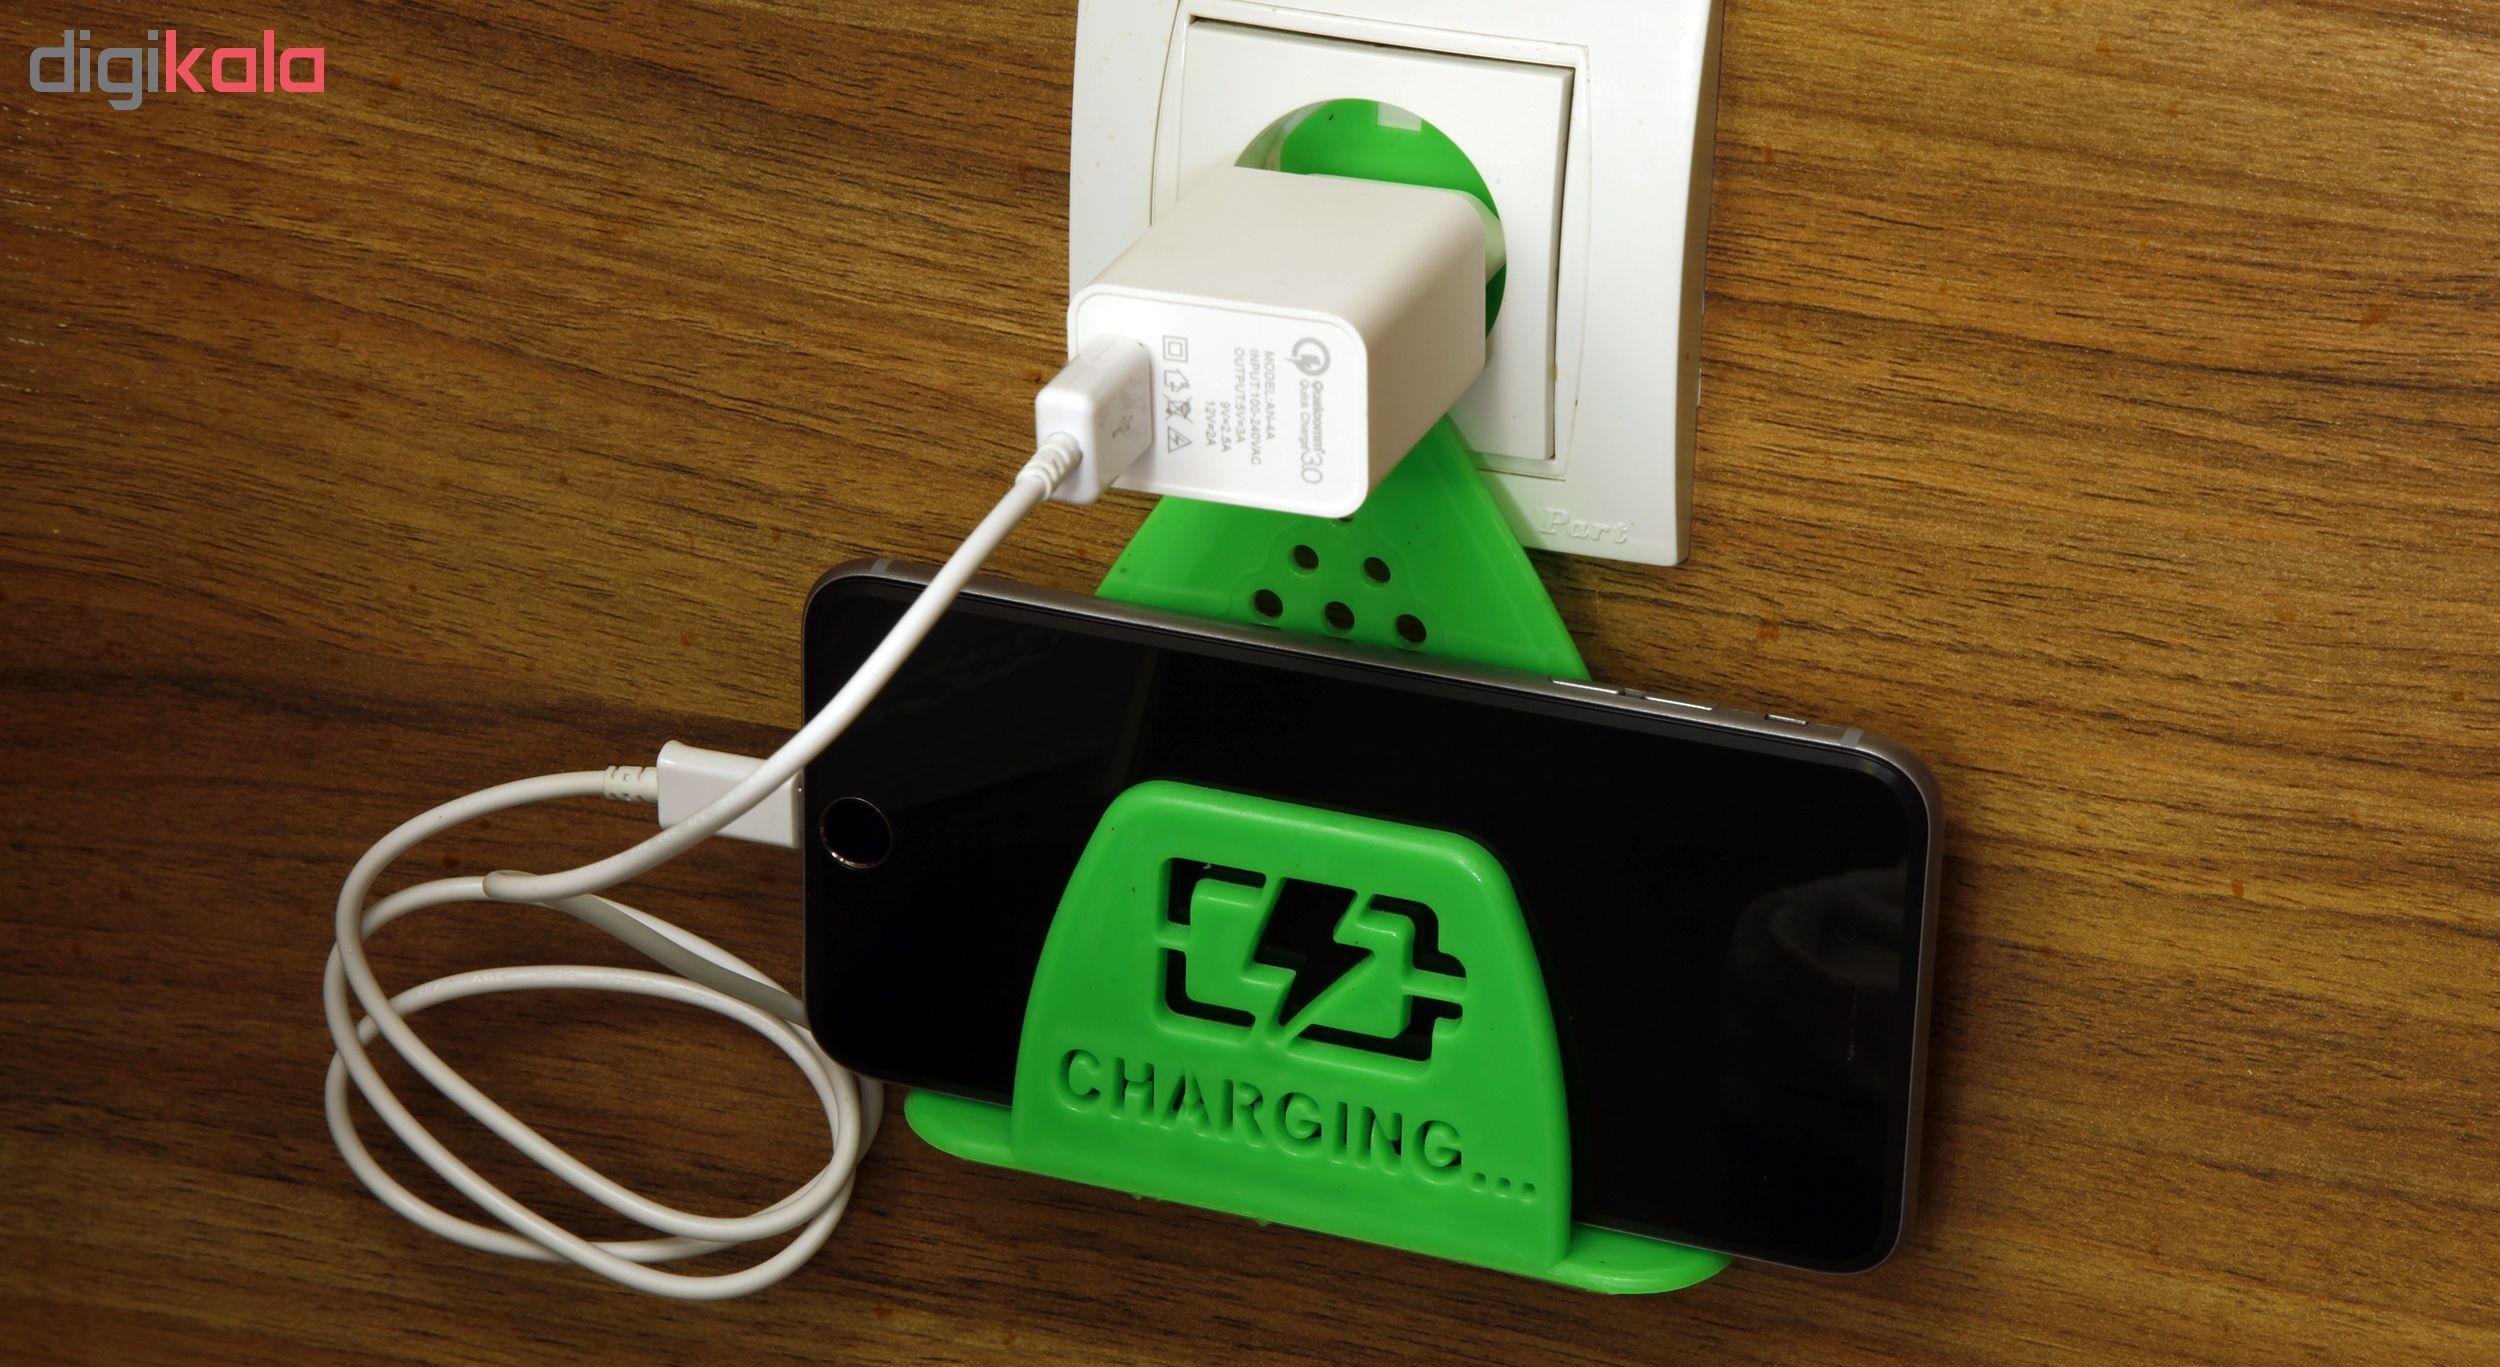 پایه نگهدارنده شارژر موبایل مدل Hng 0229 main 1 9